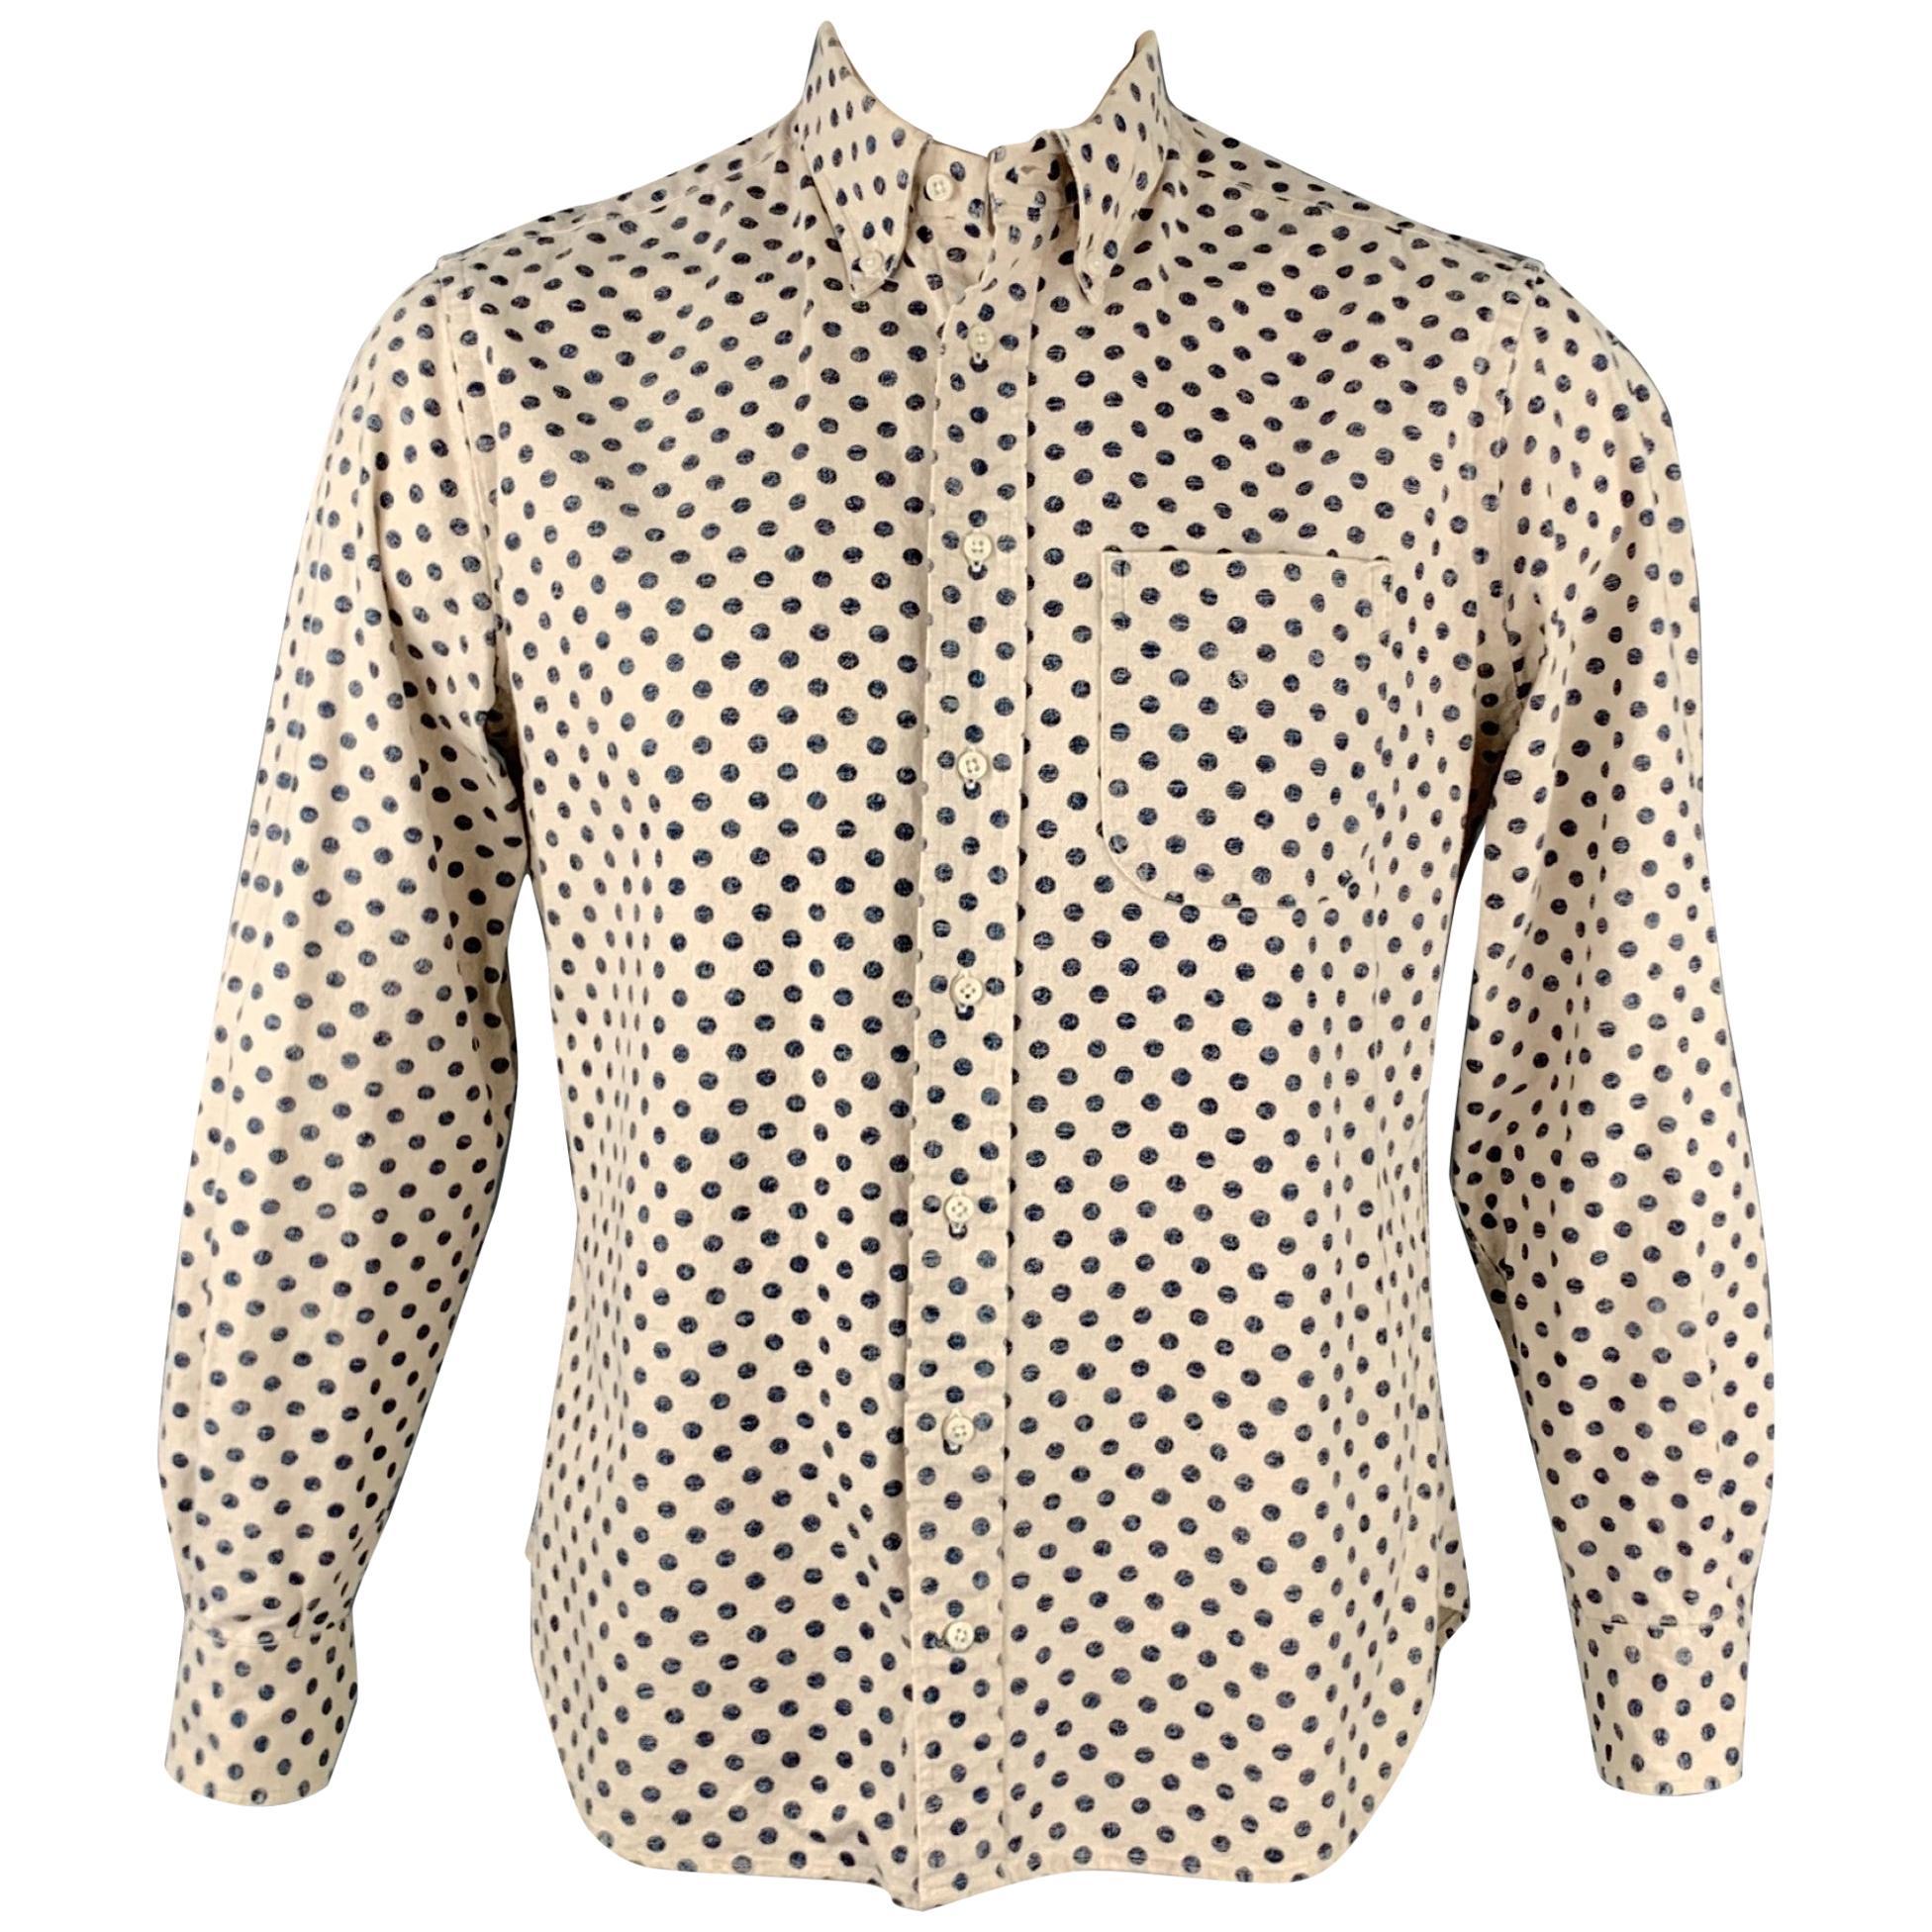 GITMAN VINTAGE Size L Beige & Navy Dot Print Cotton / Linen Long Sleeve Shirt